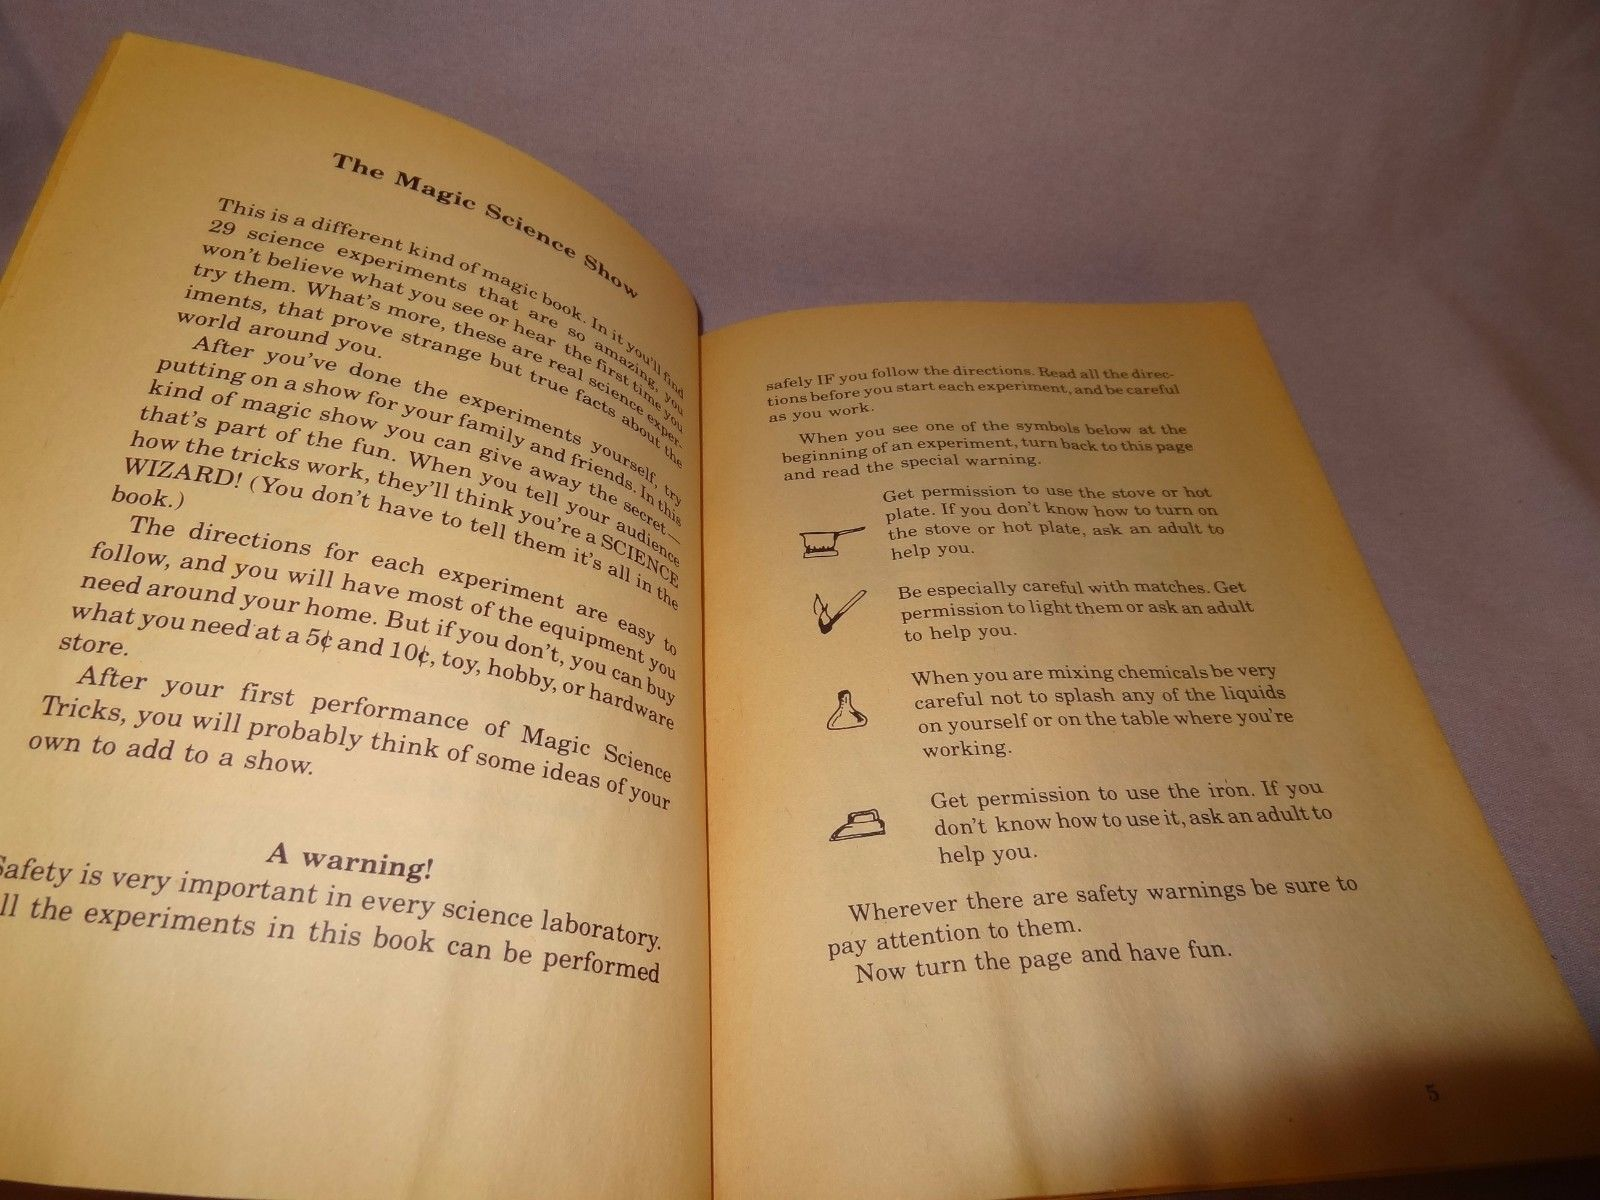 Magic Science Tricks Paperback Book 1977 Scholastic Dinah Moche Homeschool